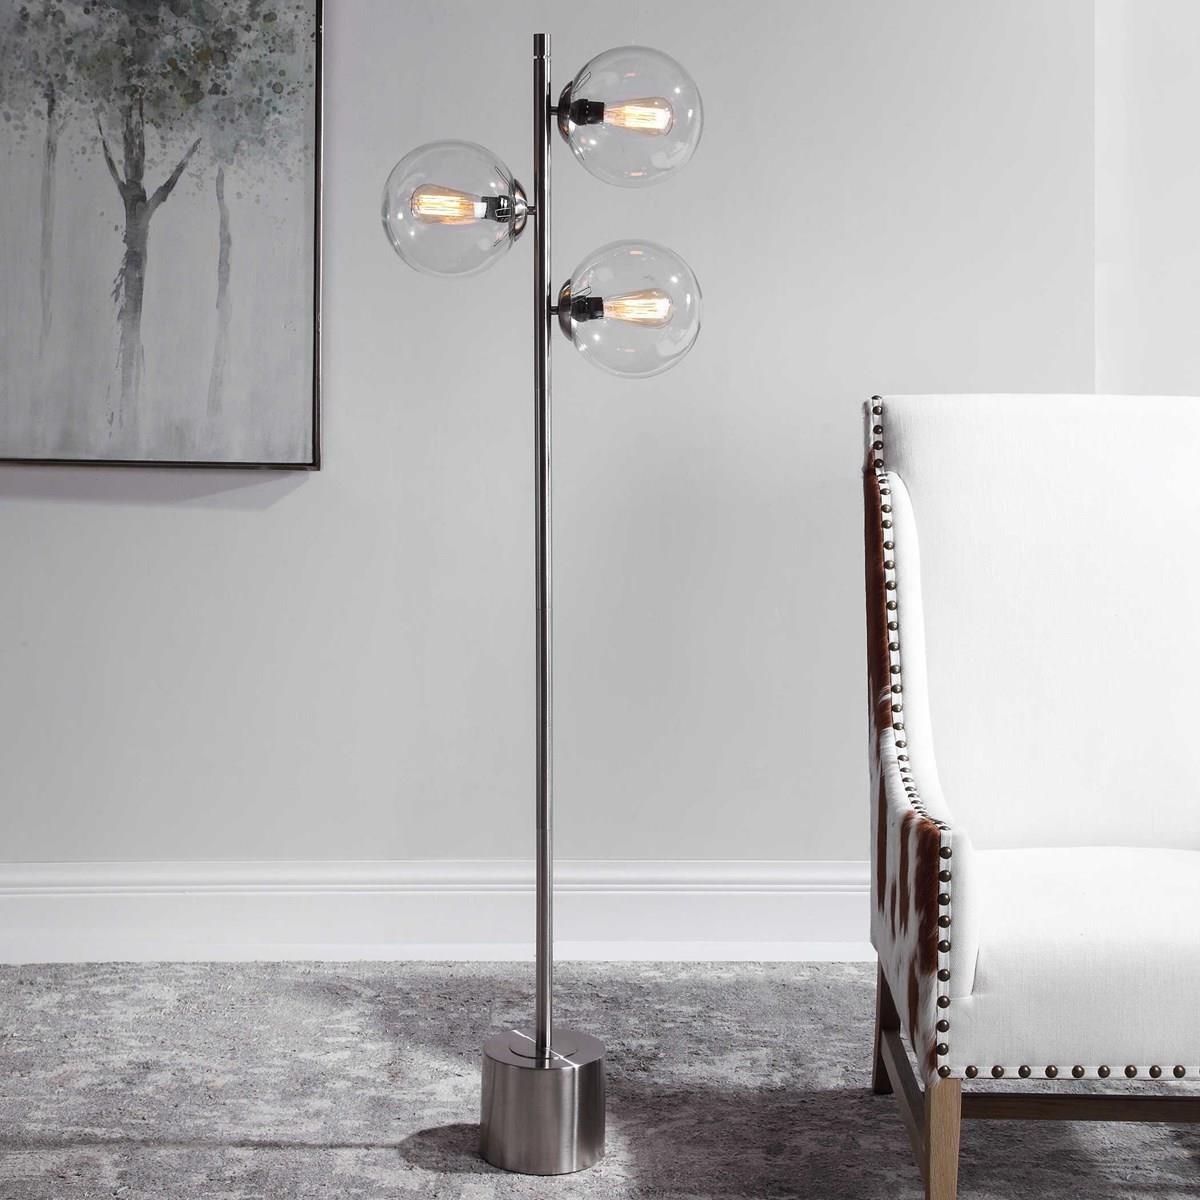 Floor Lamps REMI FLOOR LAMP by Unique at Walker's Furniture